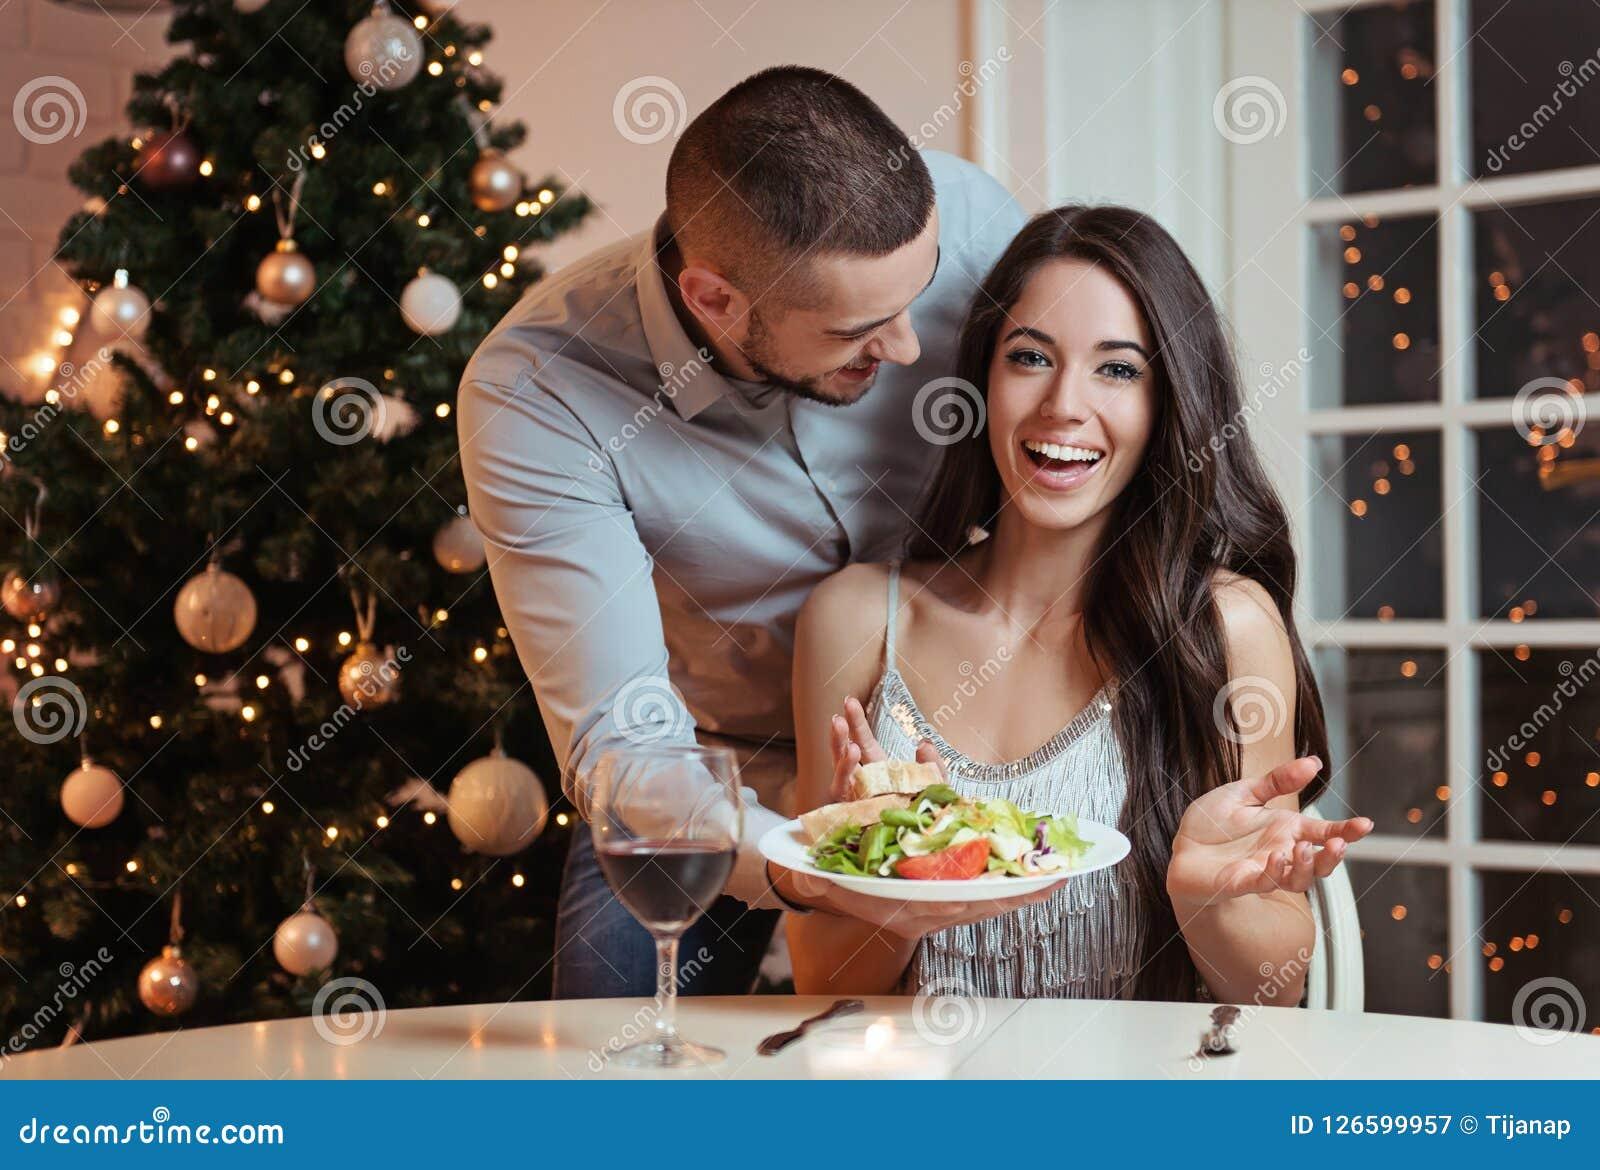 Couple in love, having a romantic dinner